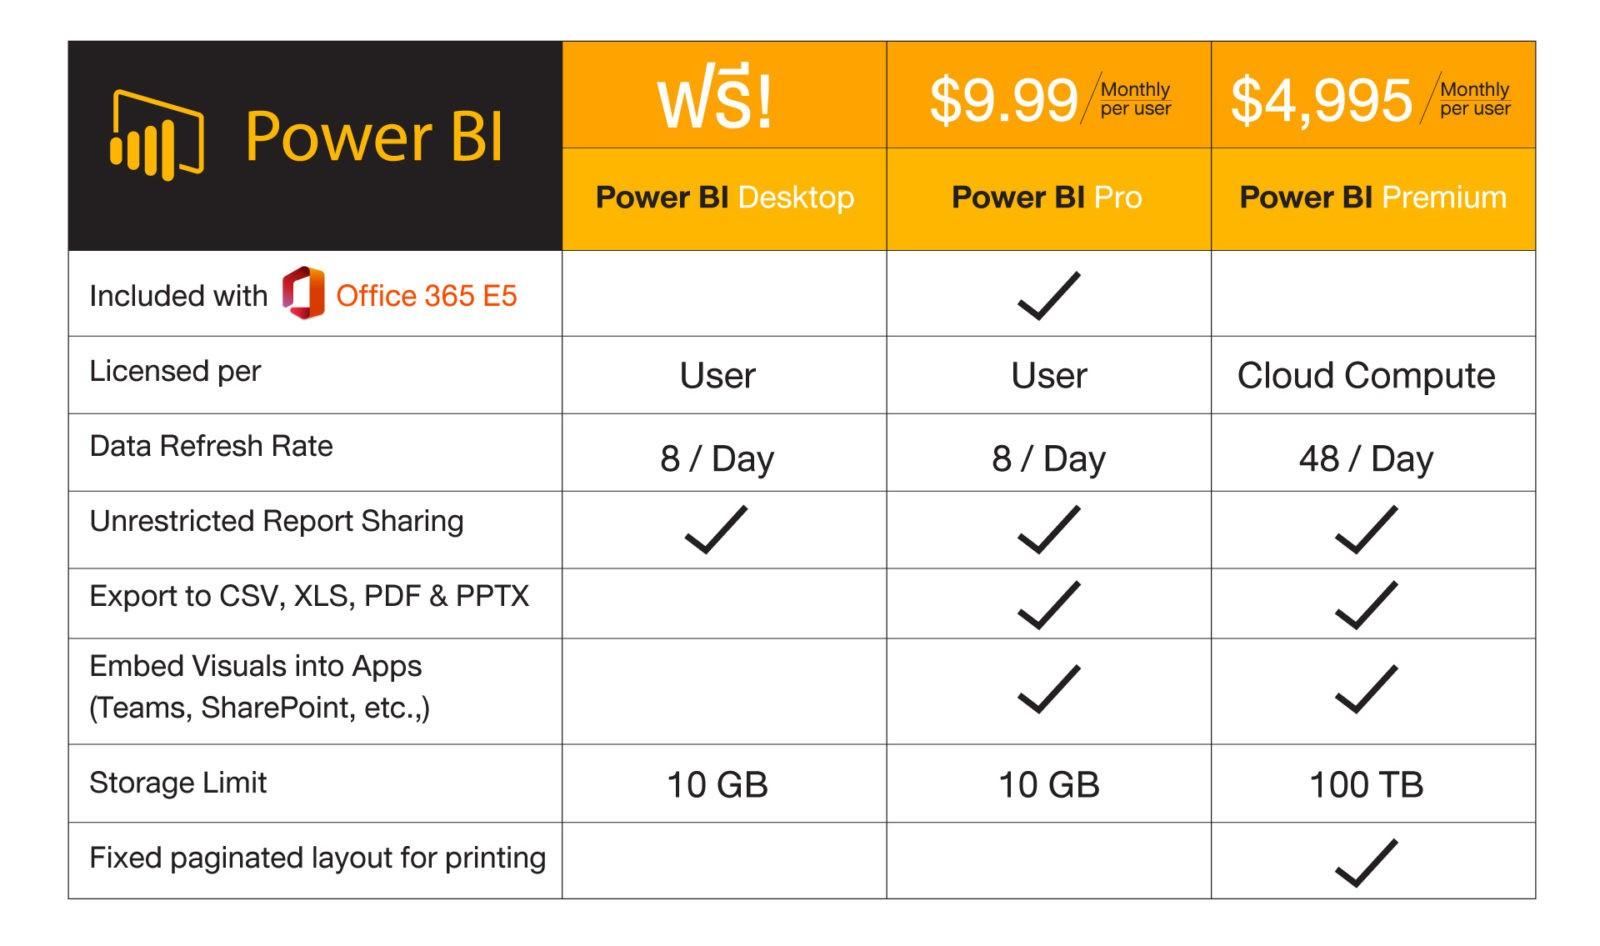 PowerBI Pro Vs Premium Pricelist